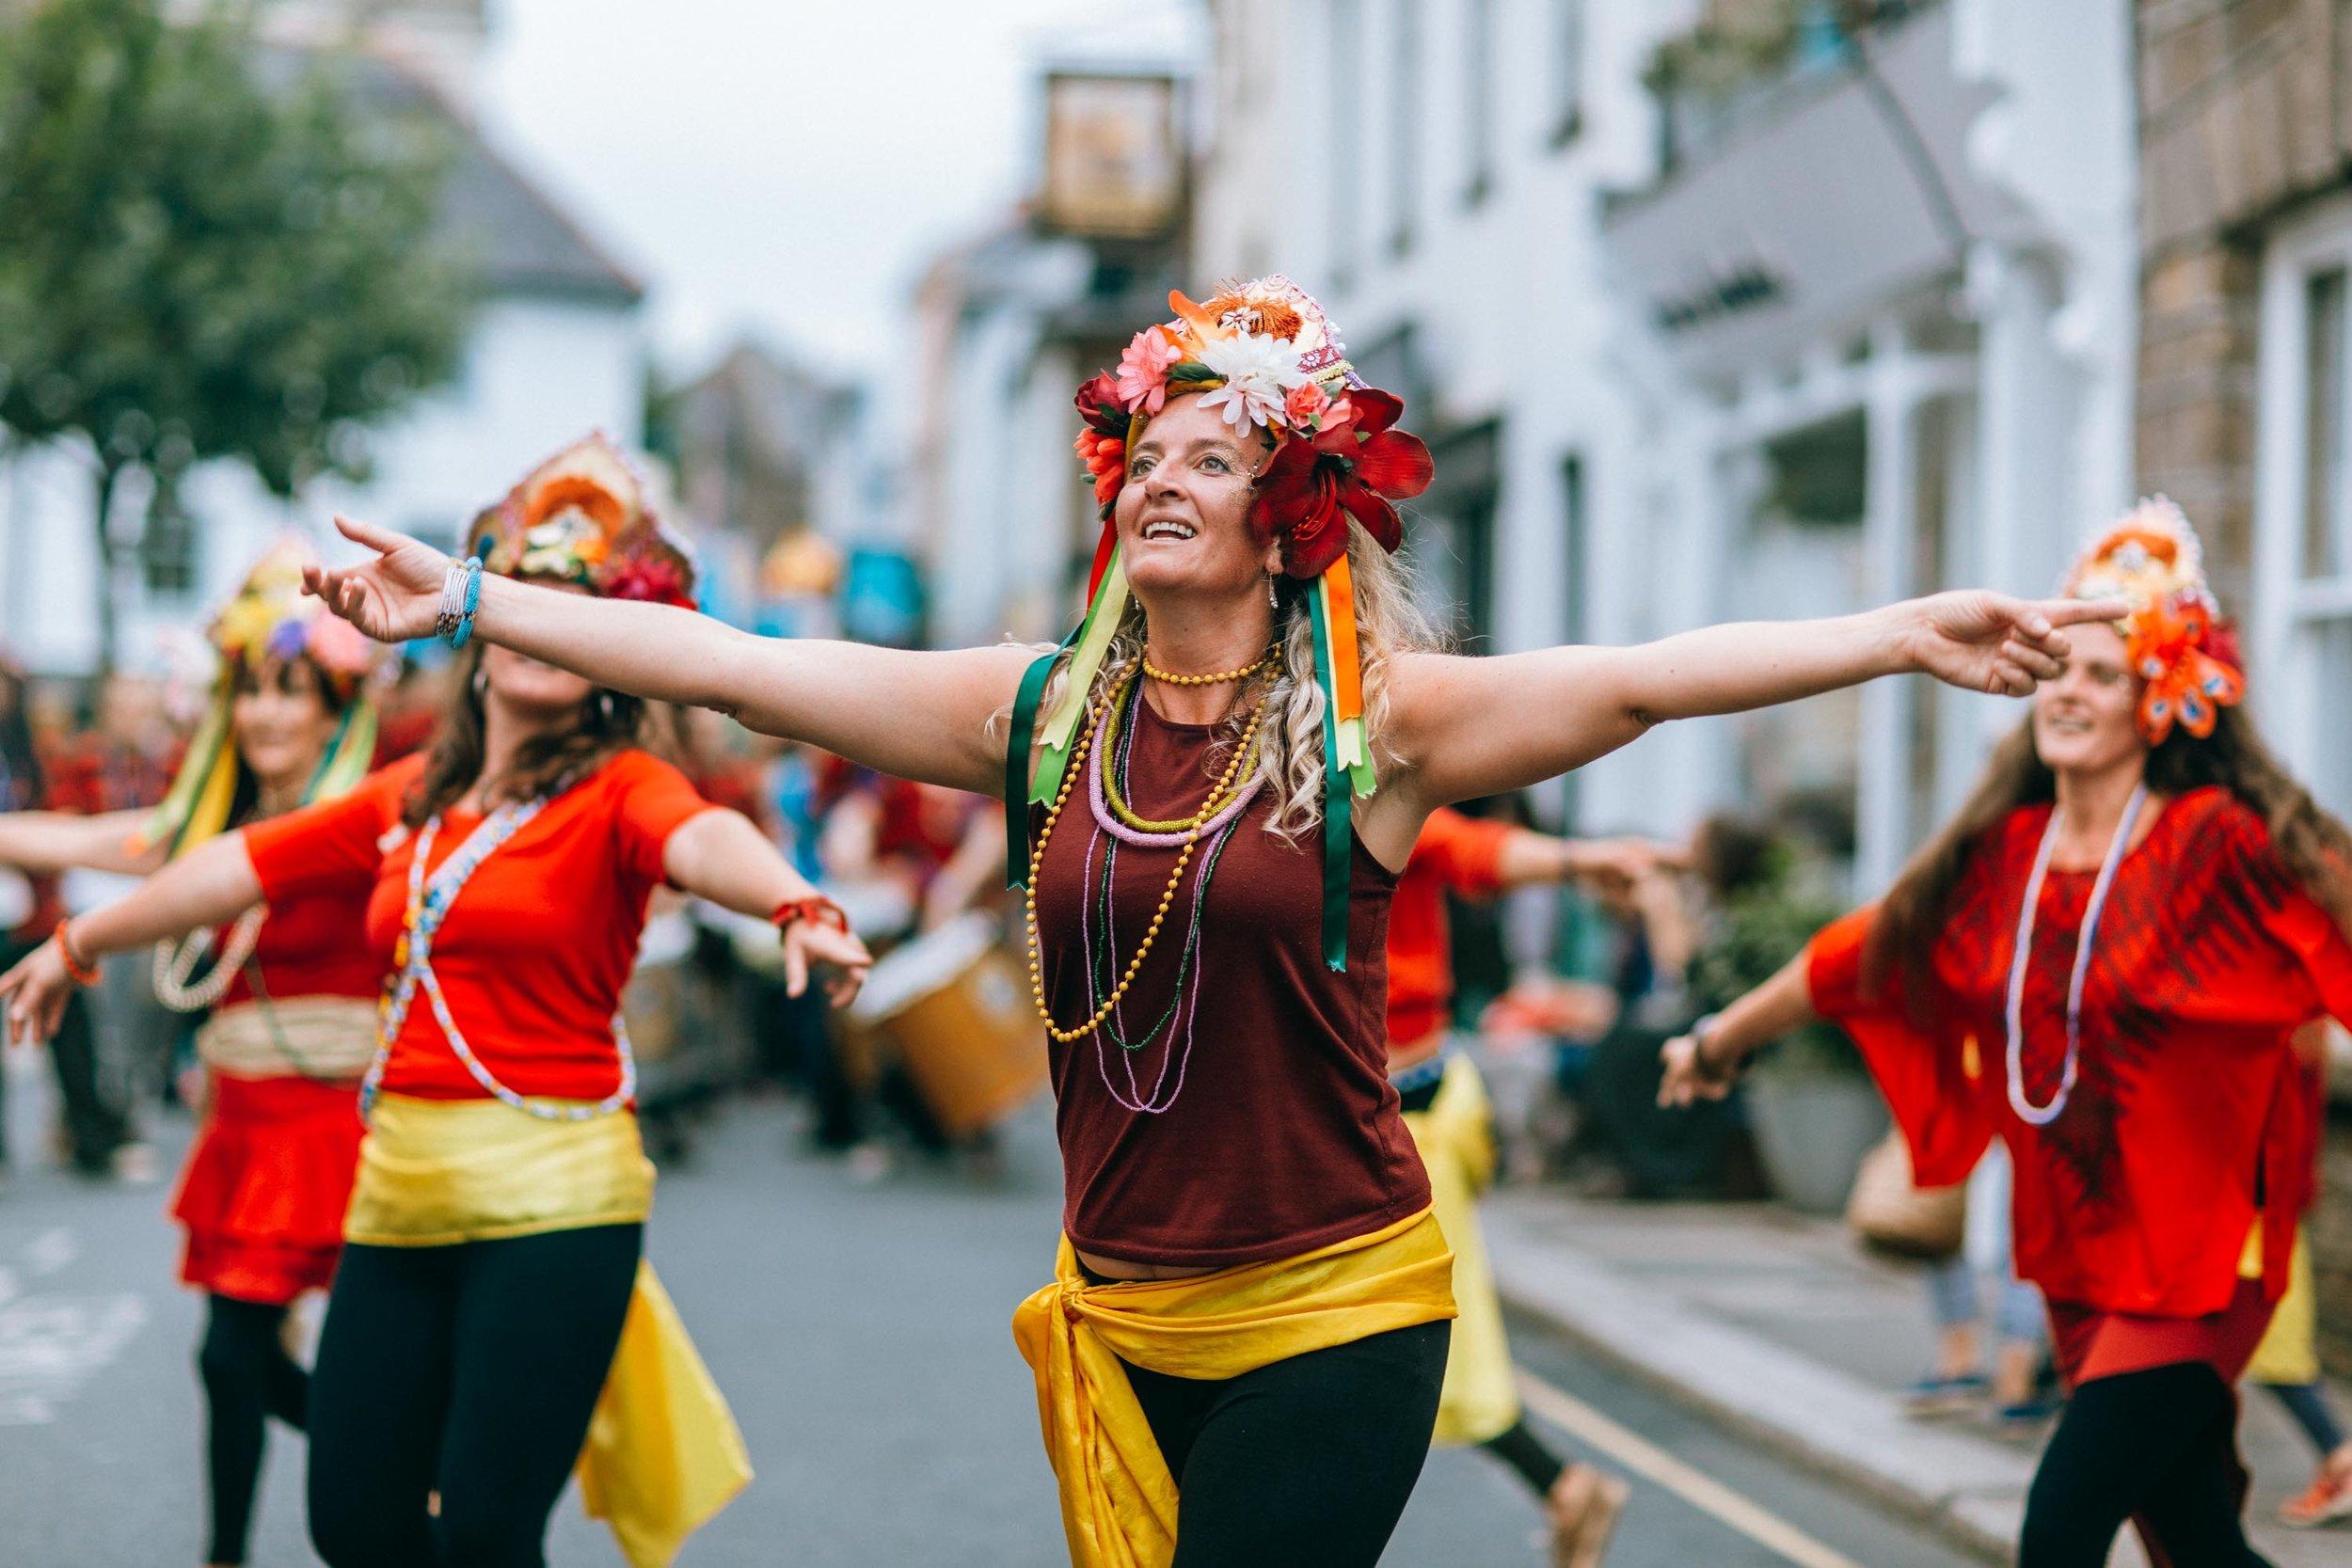 A group of dancers lead the Penryn Kemeneth procession down Penryn high street. Penryn, Cornwall, UK. 14th Oct 2017.